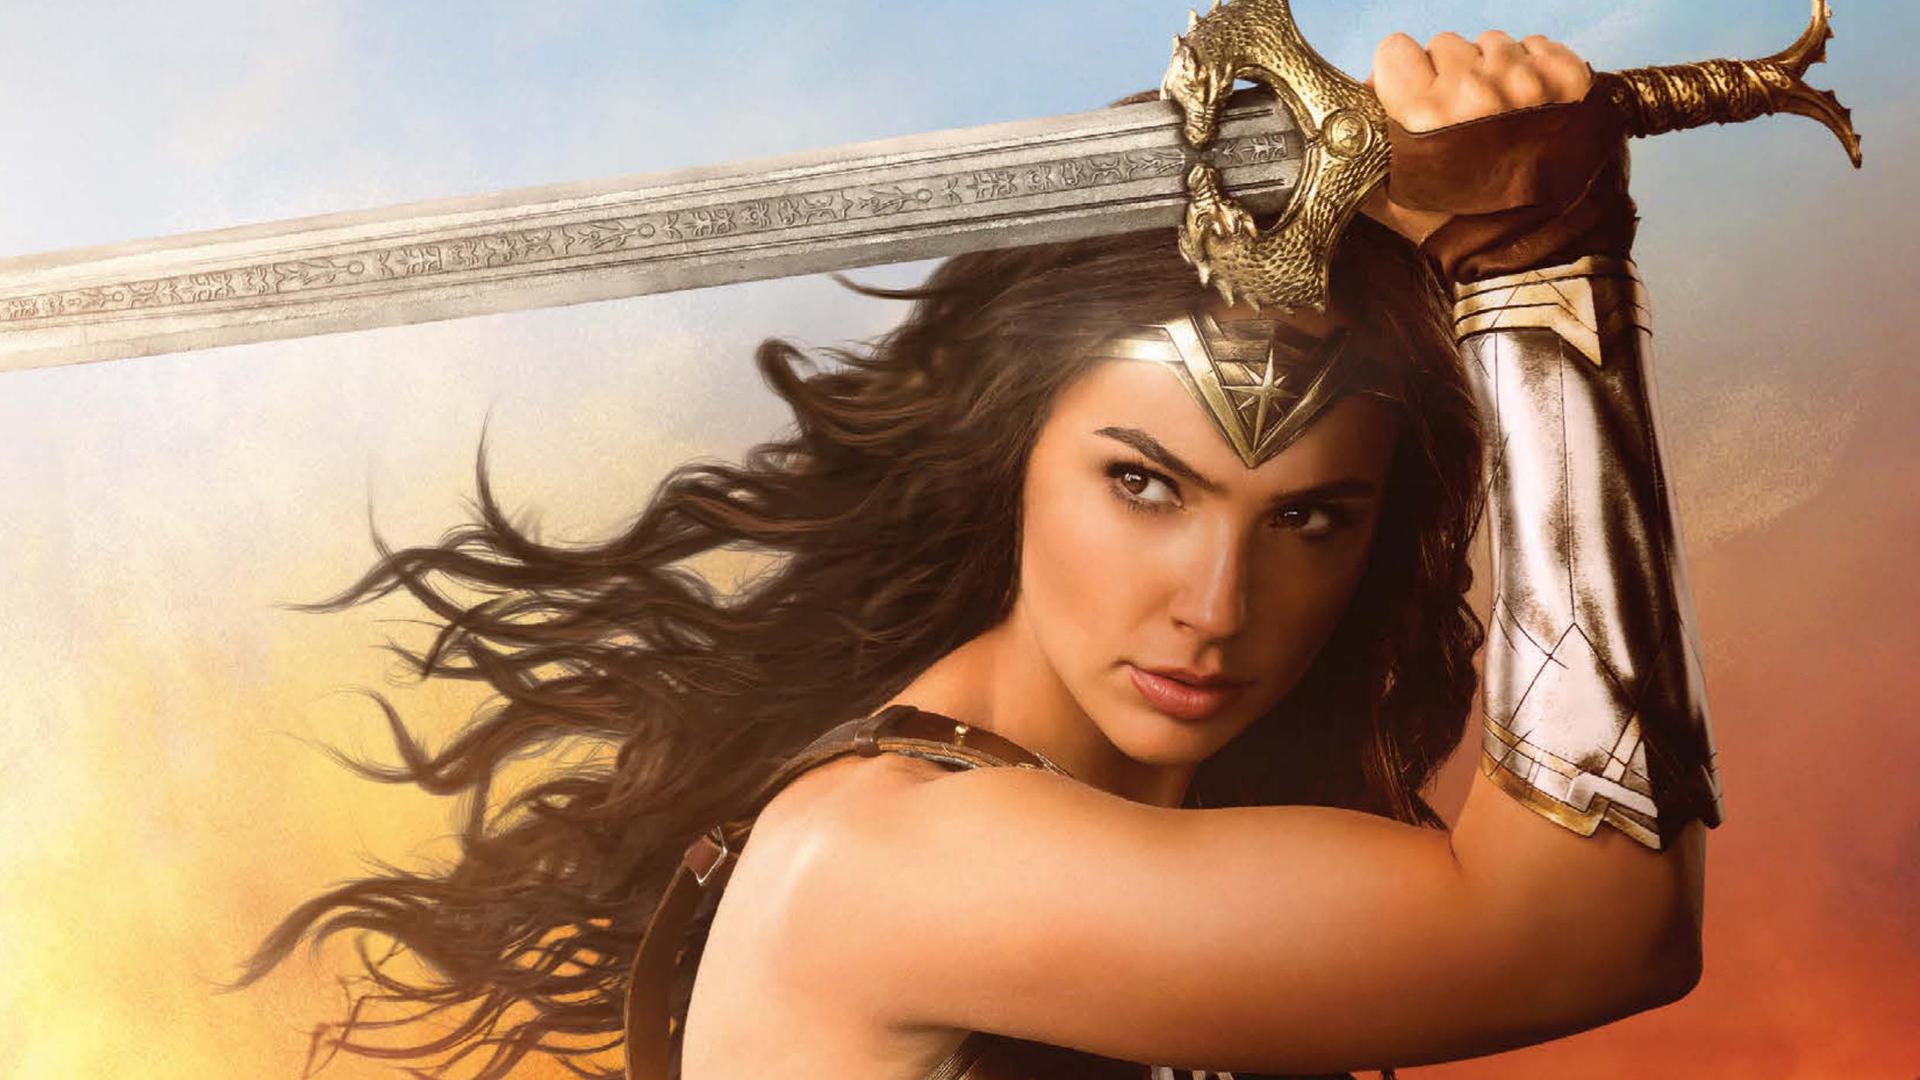 Wonder Woman 2017 Wallpaper Full Hd Free Download: 1920x1080 Wonder Woman Cover Laptop Full HD 1080P HD 4k